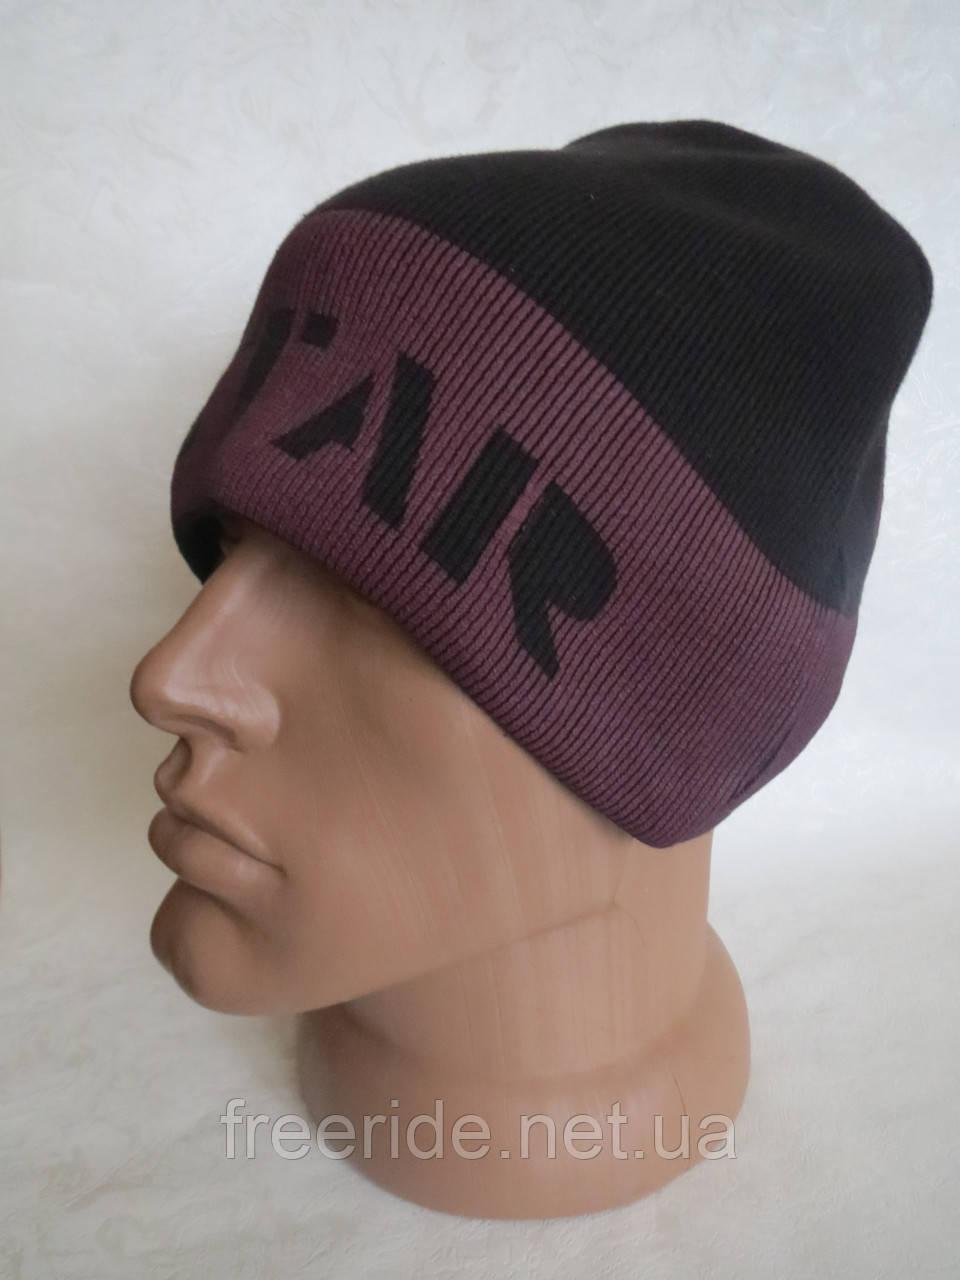 Зимова шапка HoodStar (унісекс) 54-57